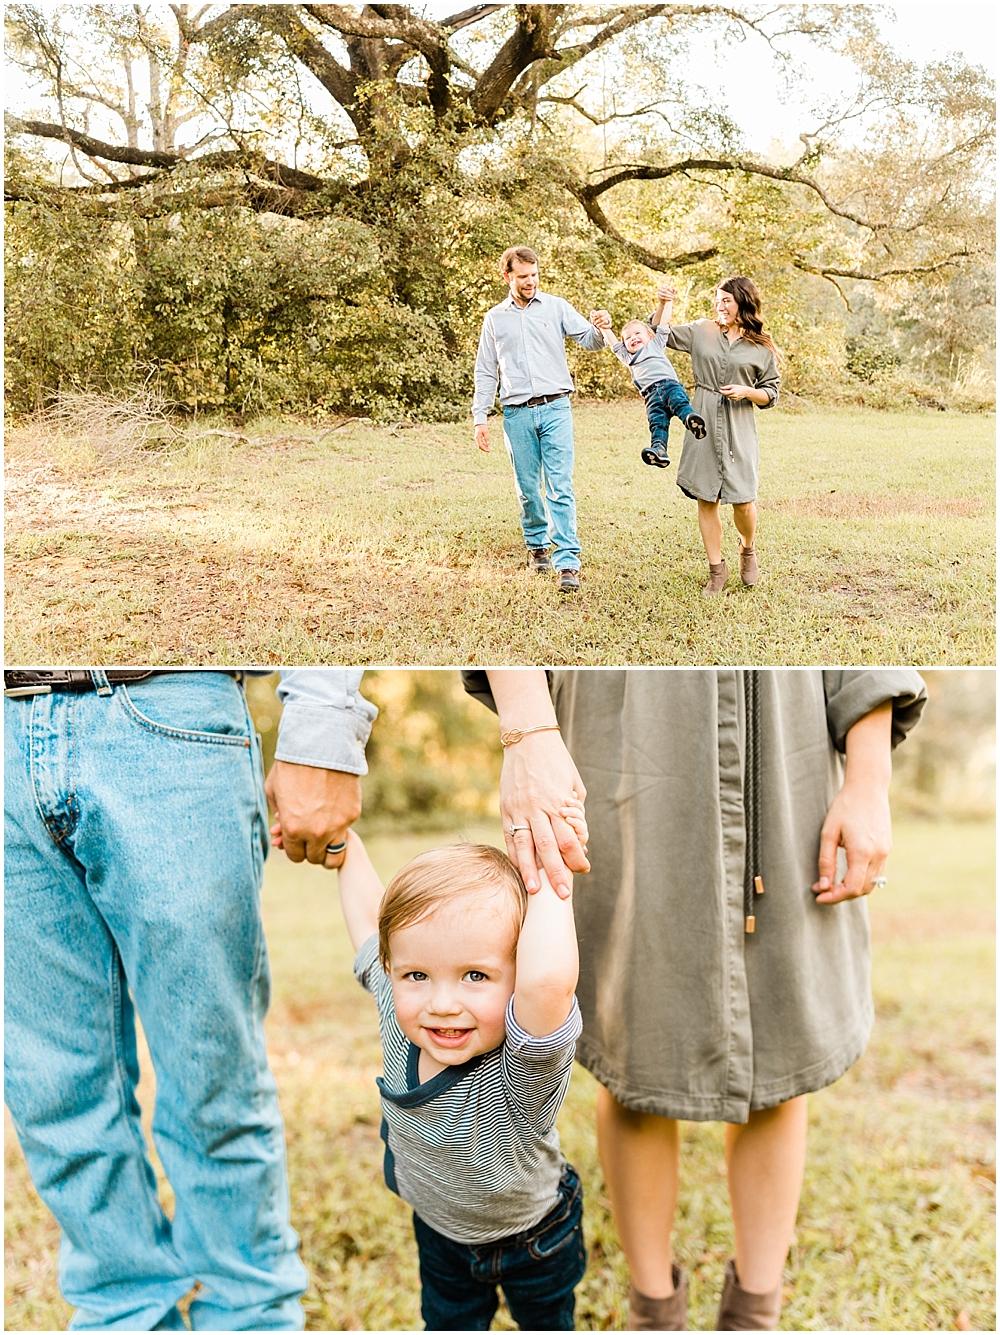 Ashton-Clark-Photography-Wedding-Portrait-Family-Photographer-Mobile-Alabama_0019.jpg